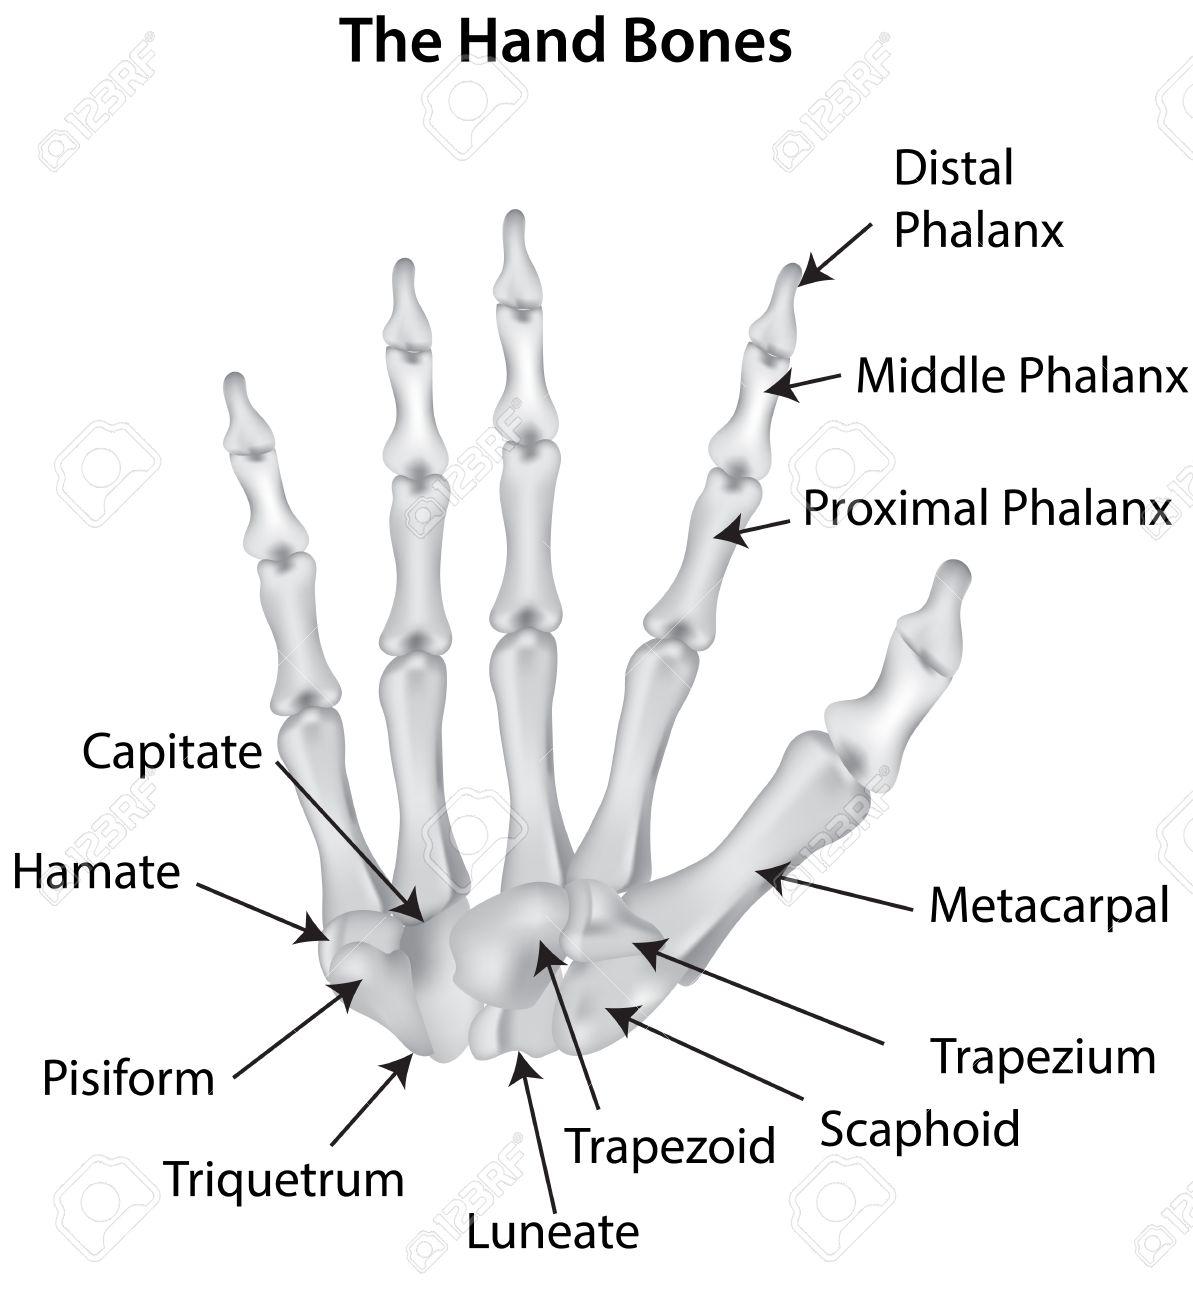 the hand bones labeled diagram royalty free cliparts vectors and  : hand diagram bones - findchart.co